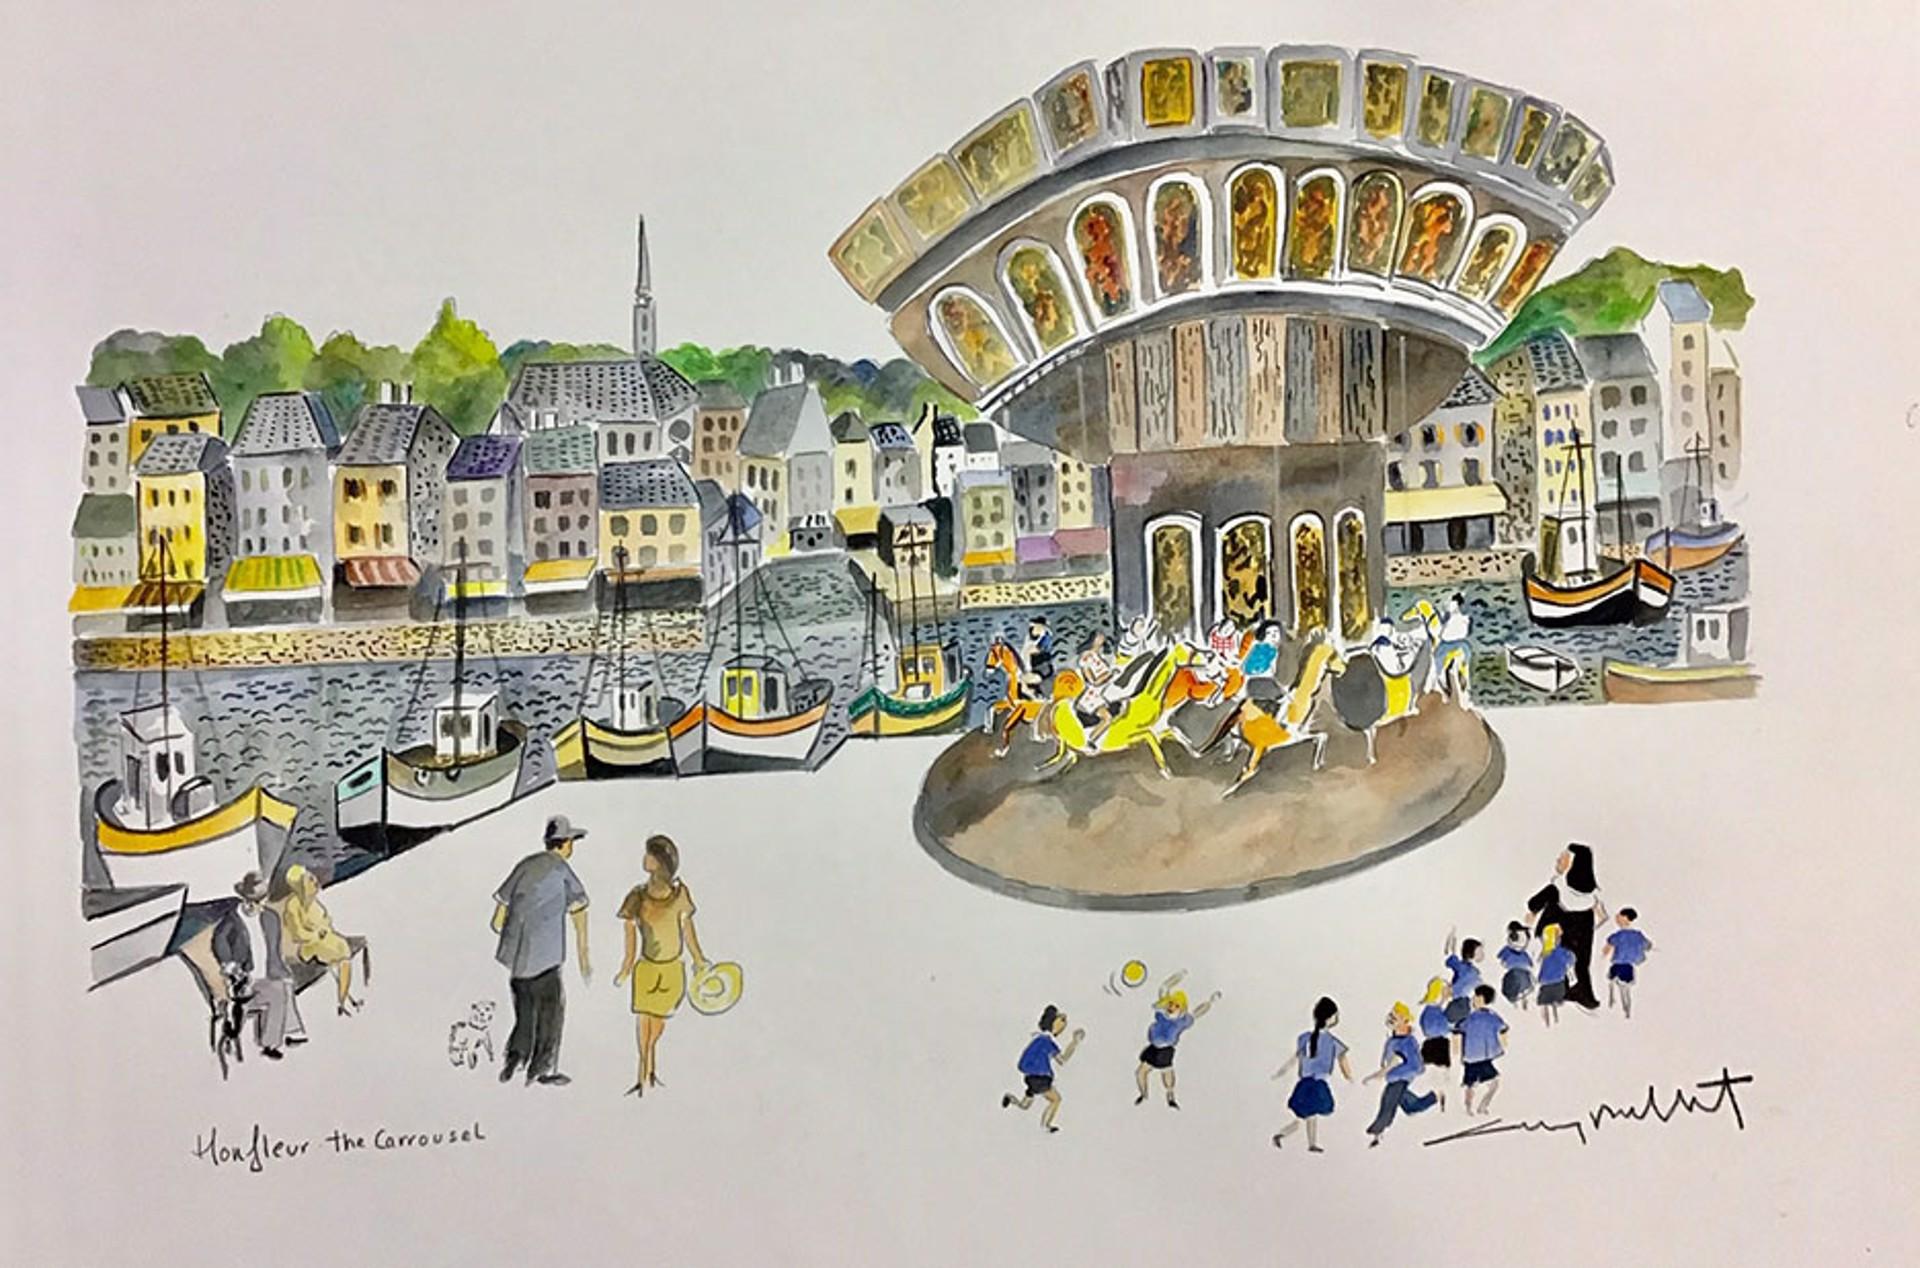 Honfleur; The Carosel by Guy Buffet